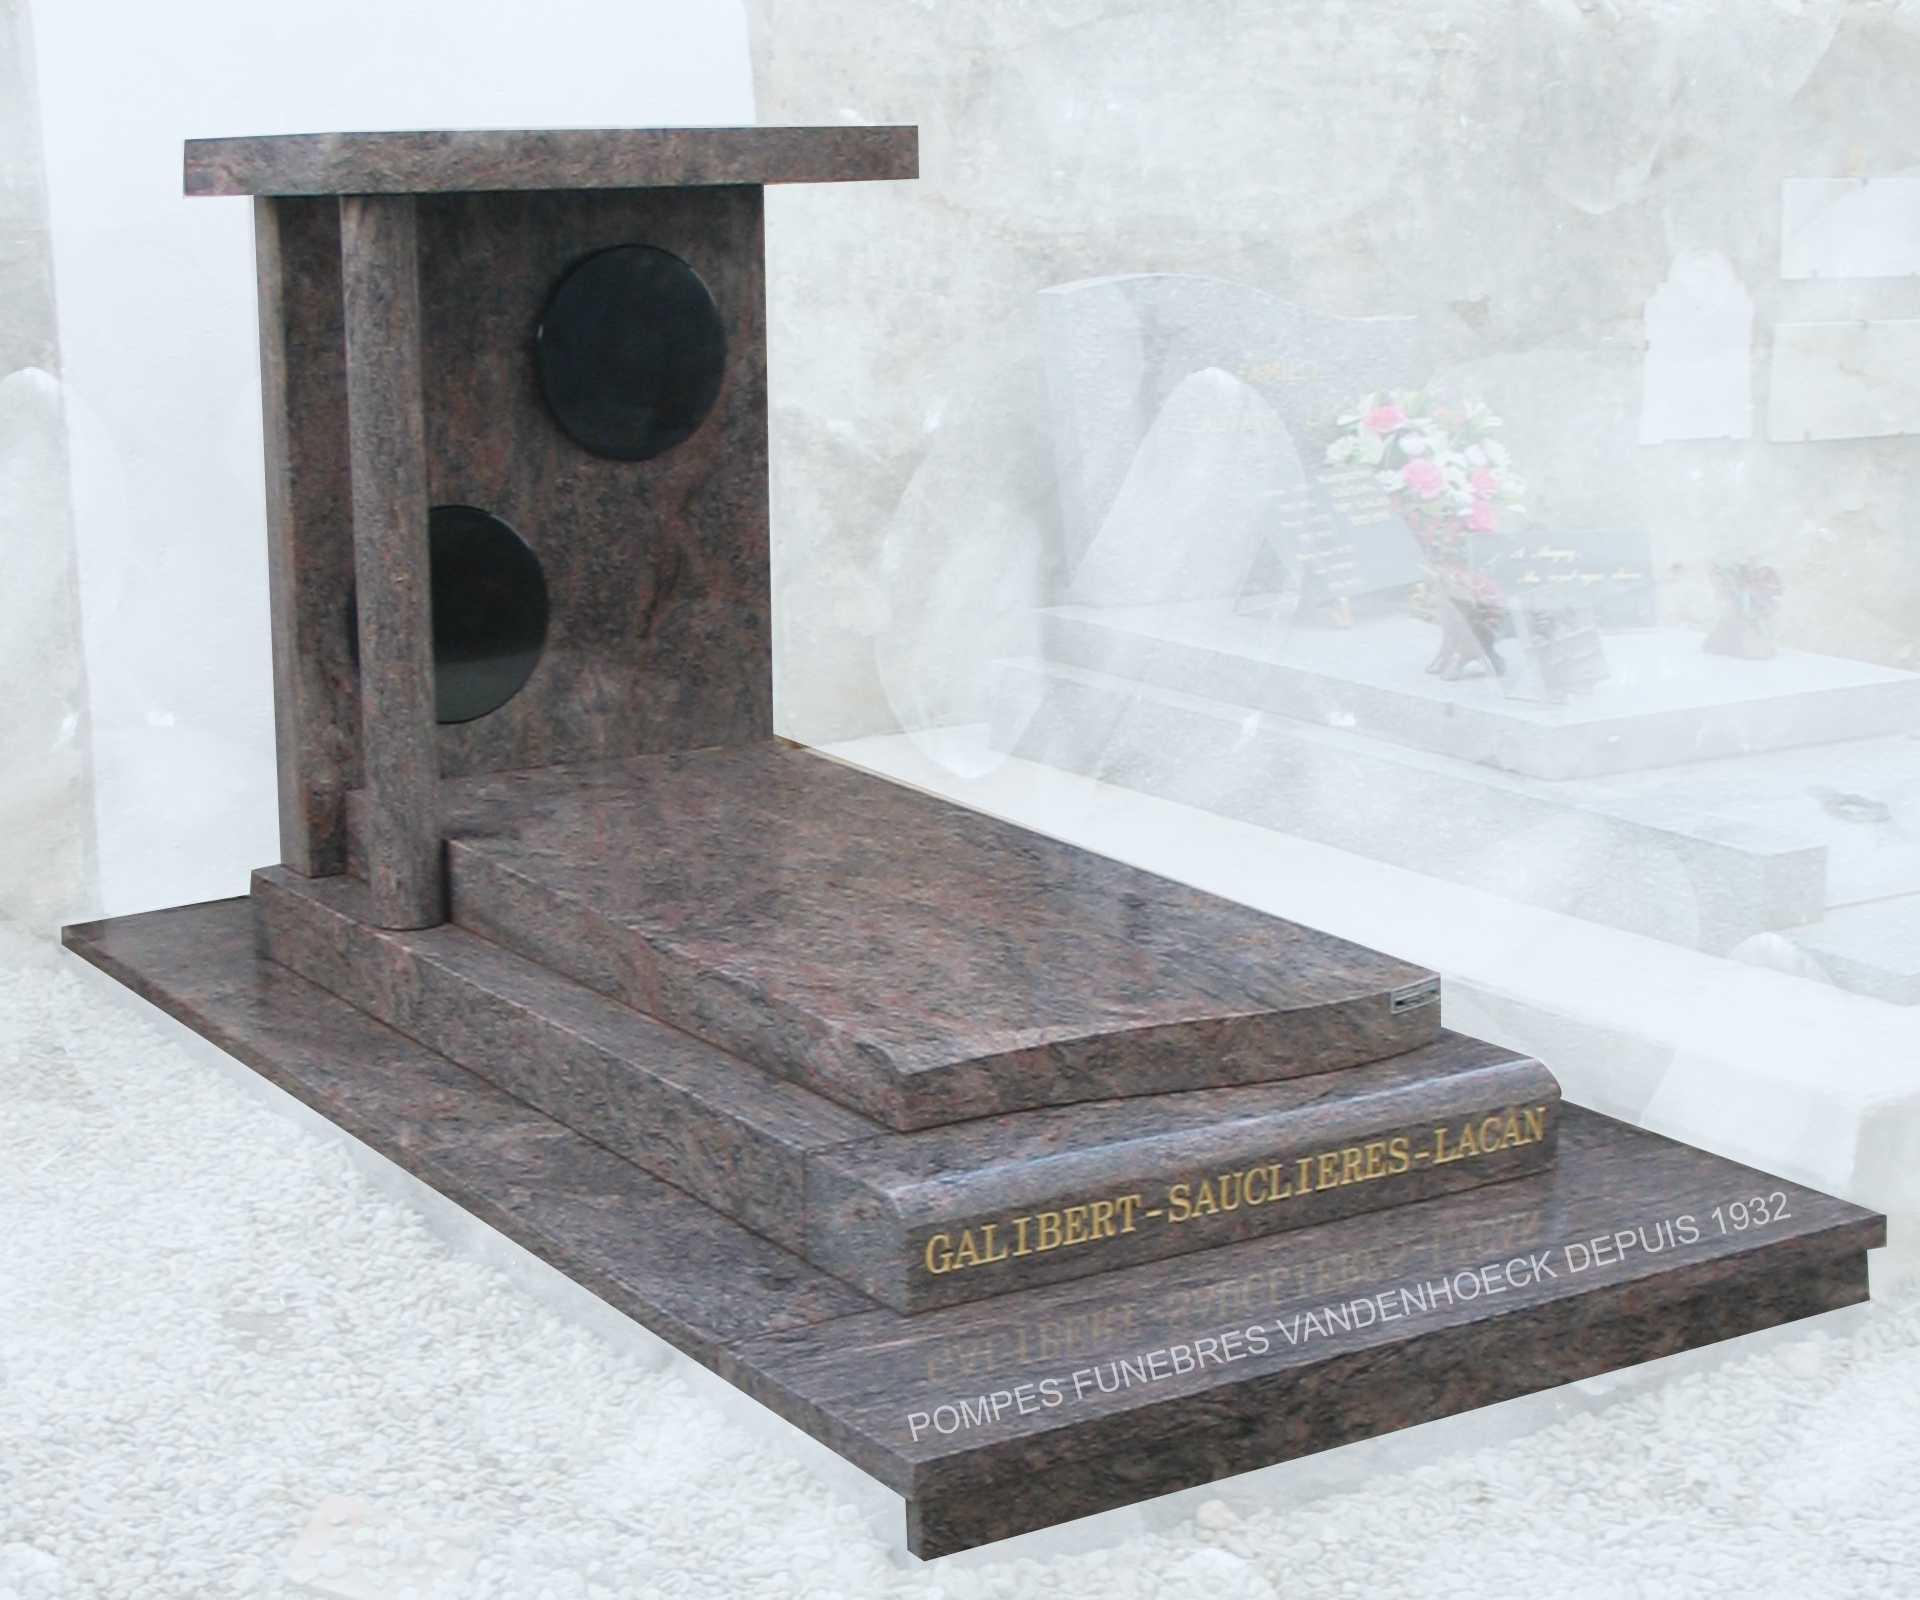 Nos monuments pierre tombale crémation